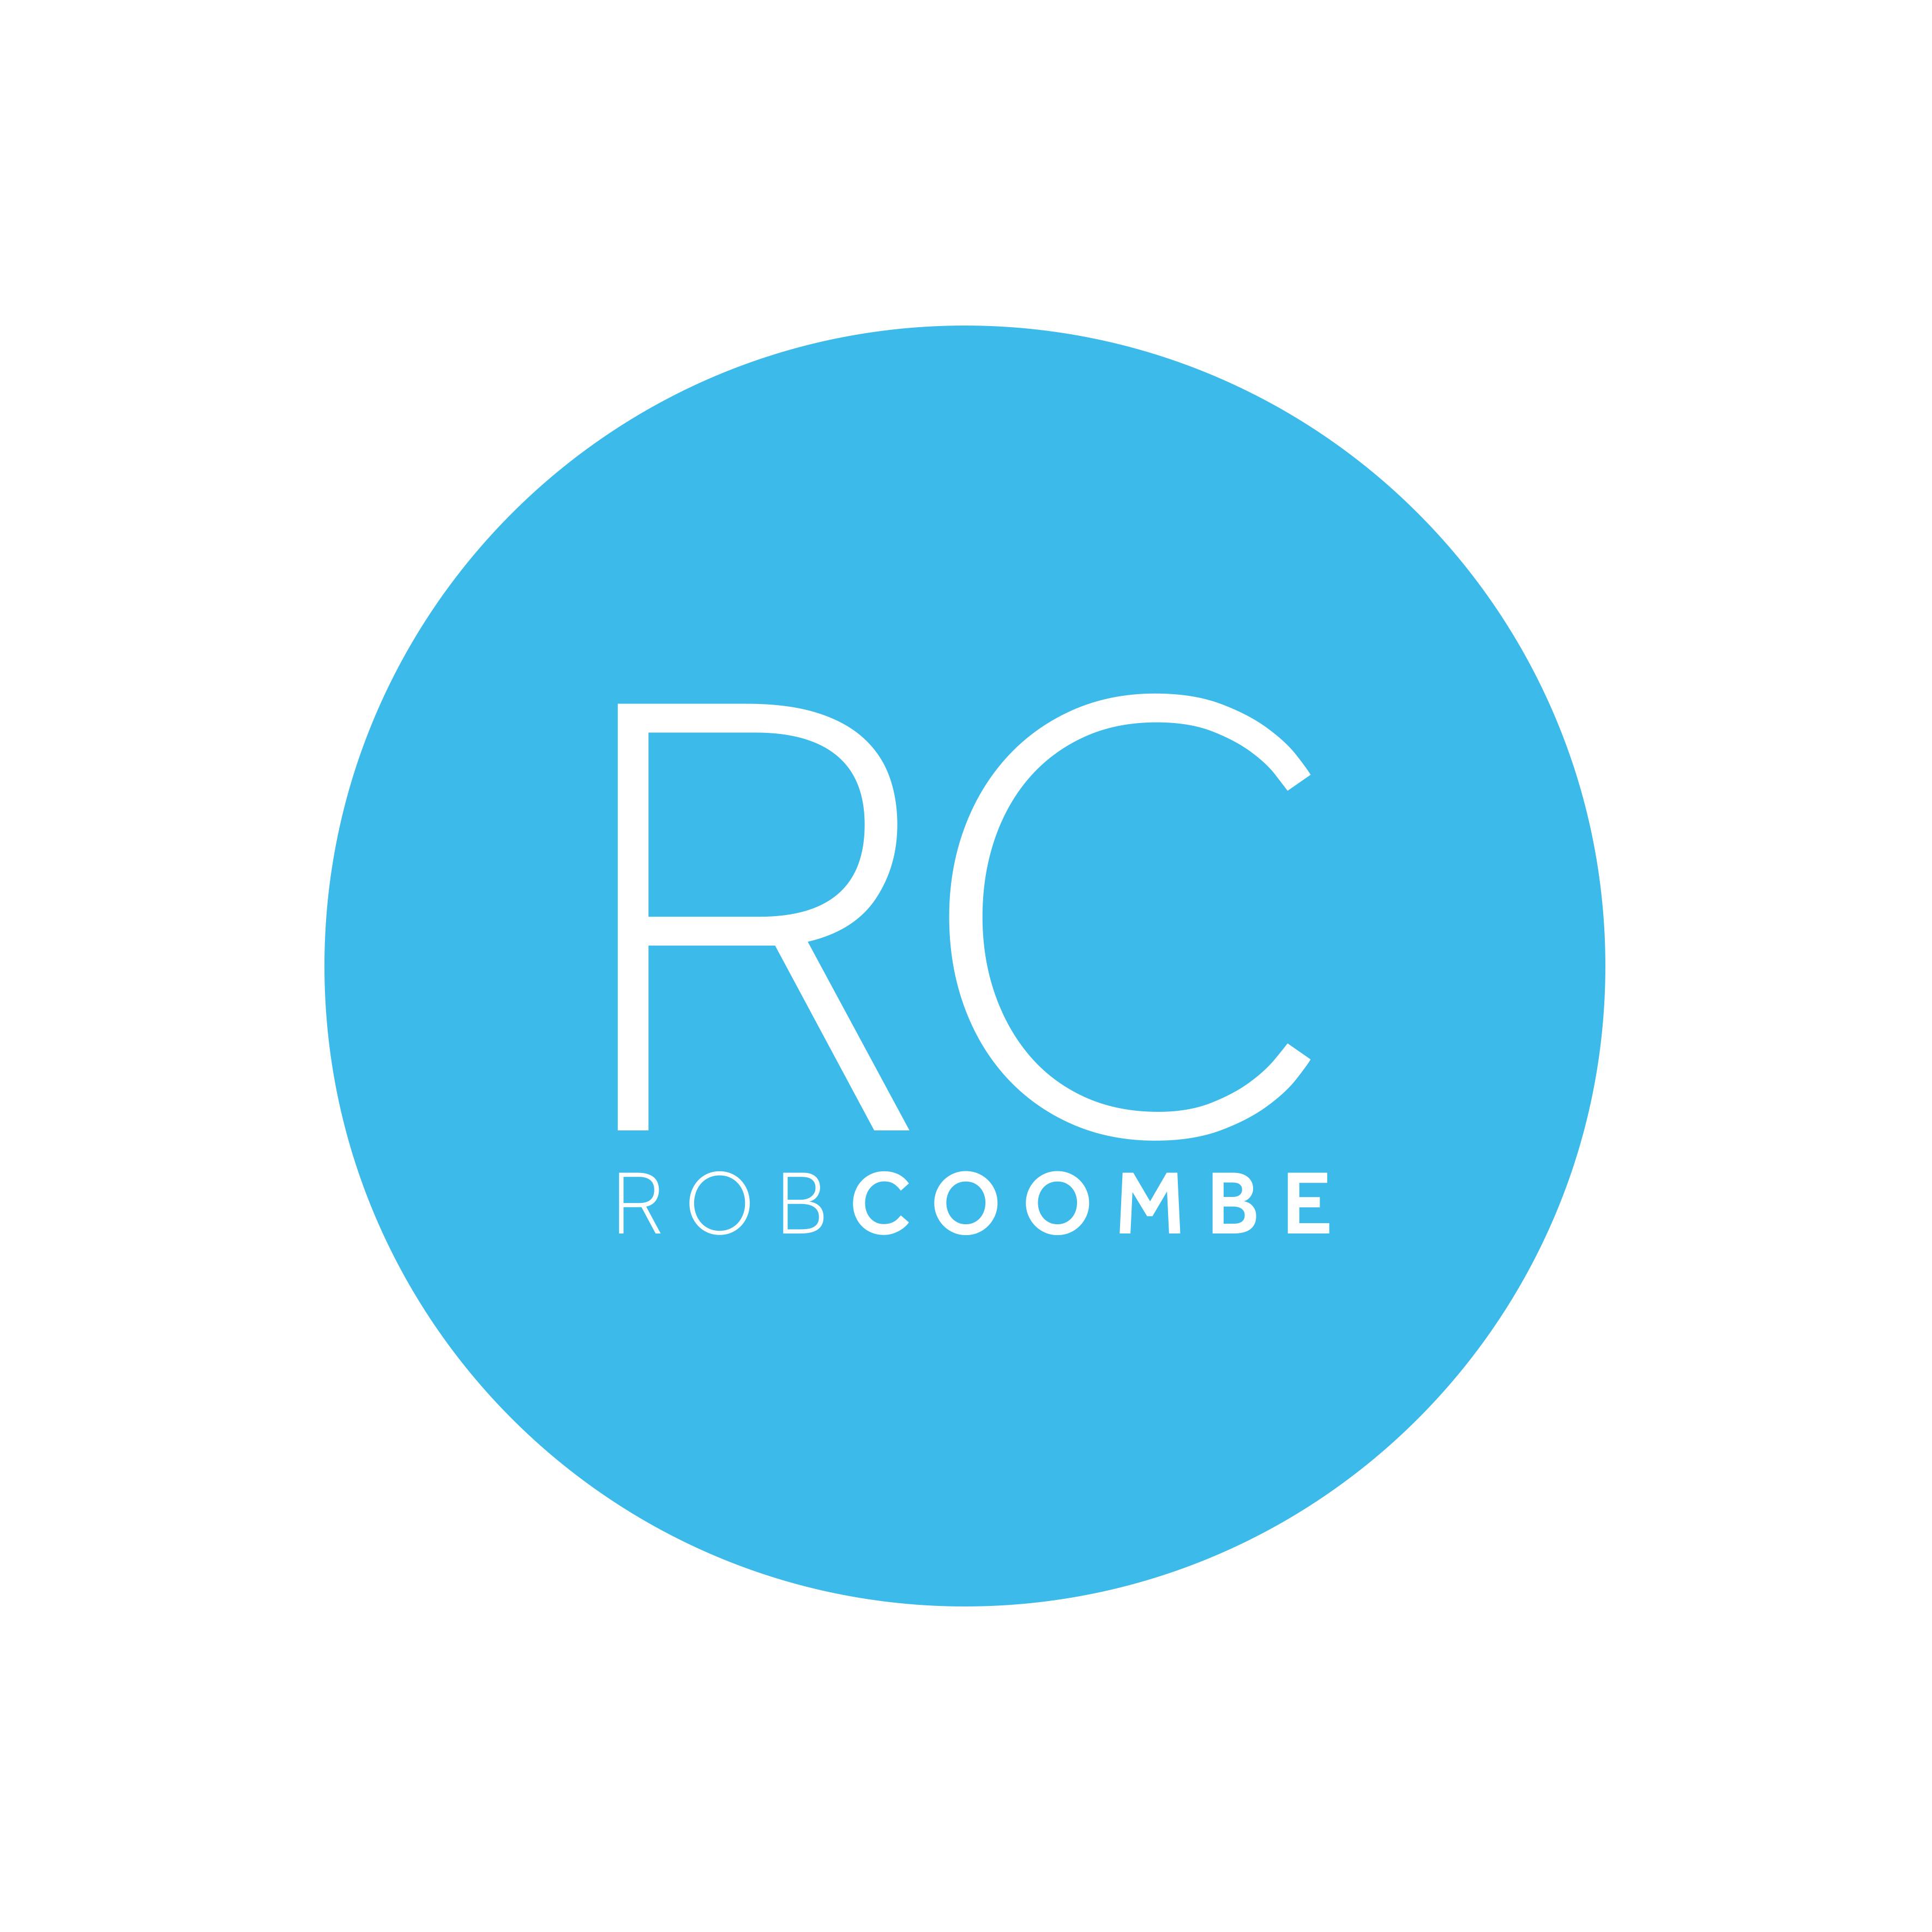 Rob Coombe Professional Photographer logo